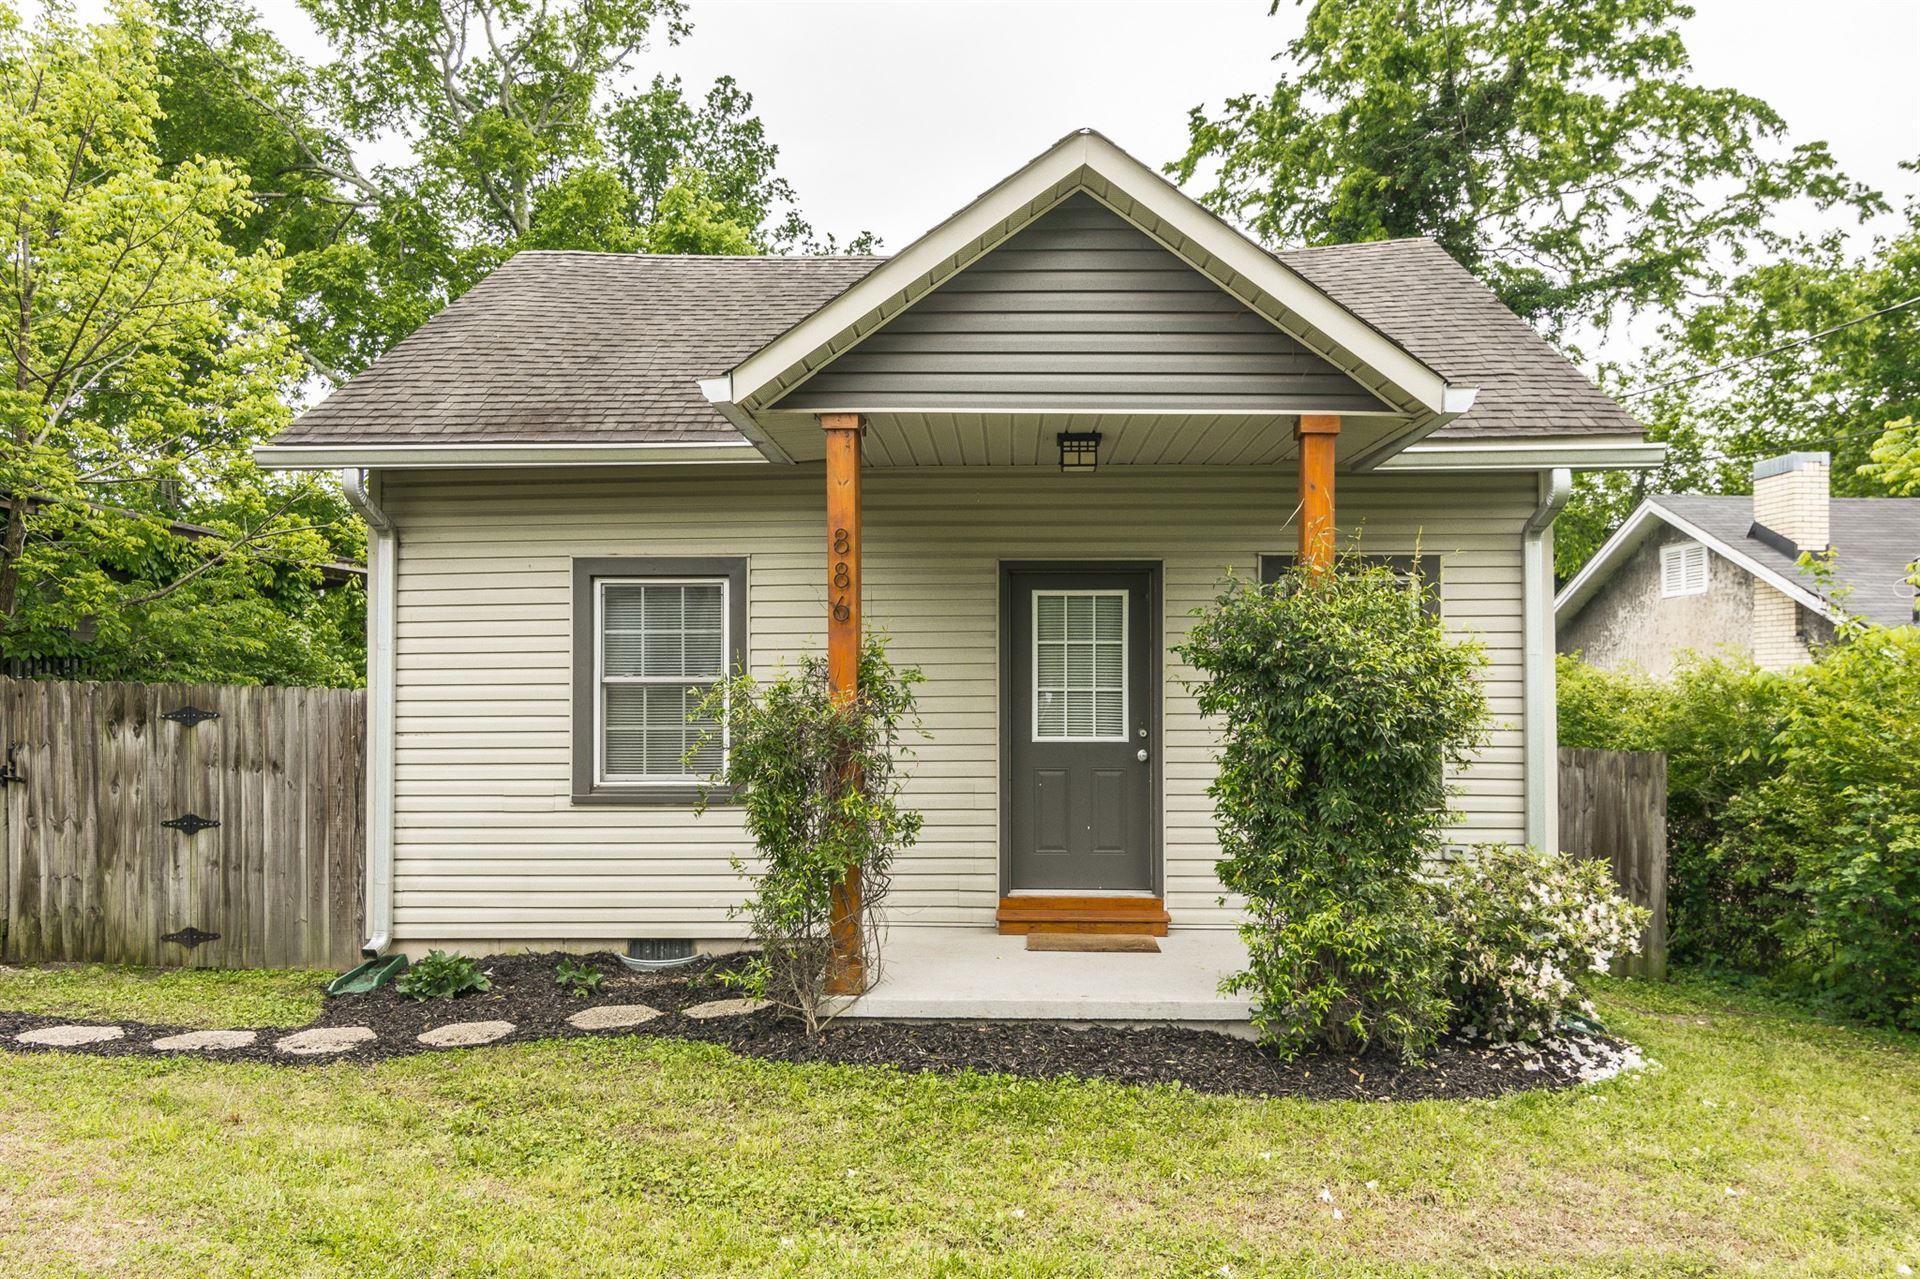 886 W Sharpe Ave, Nashville, TN 37206 - MLS#: 2252644